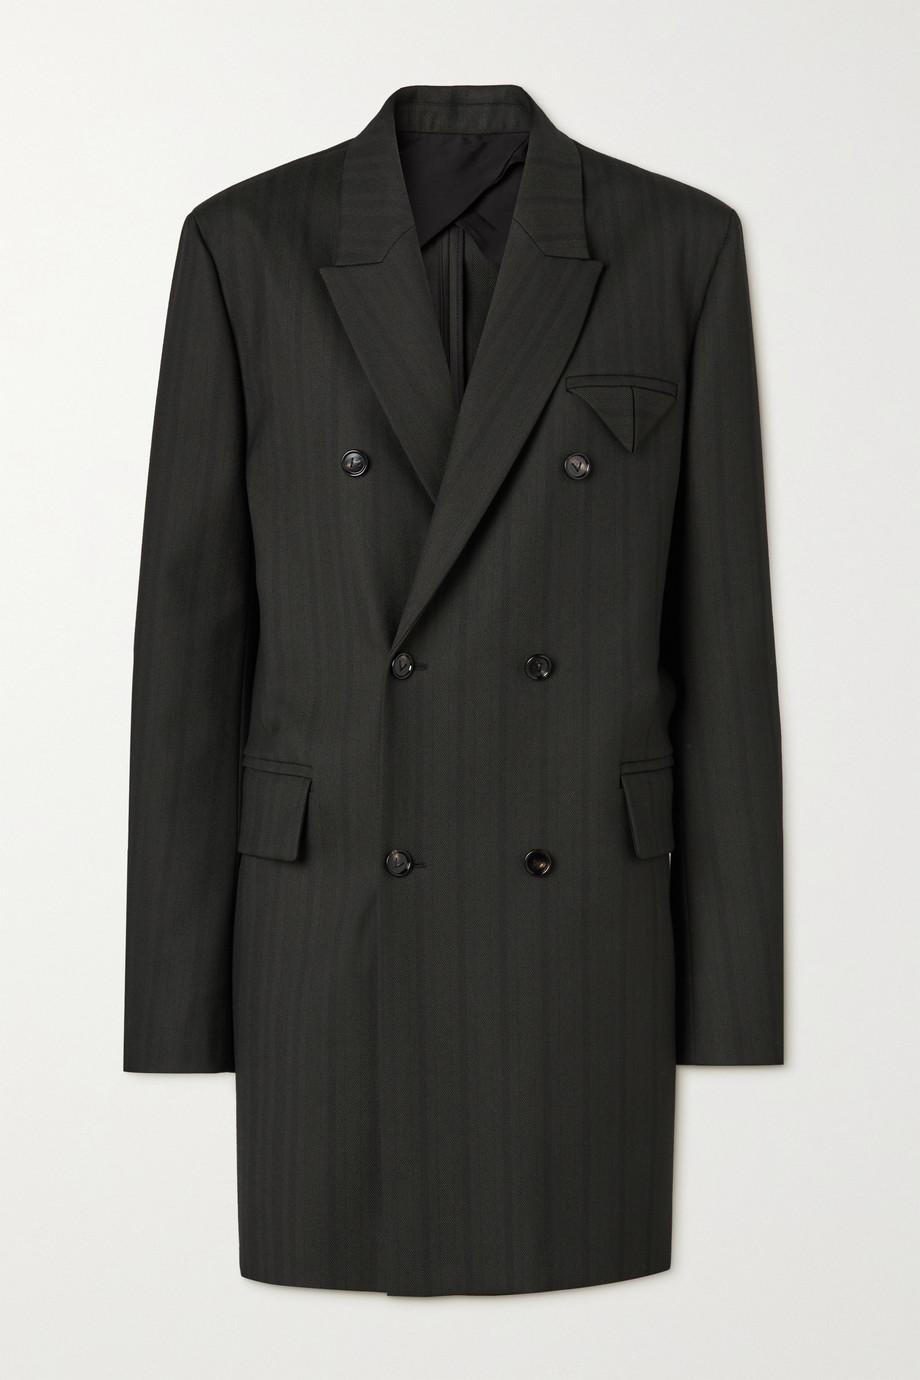 Bottega Veneta Double-breasted herringbone twill coat